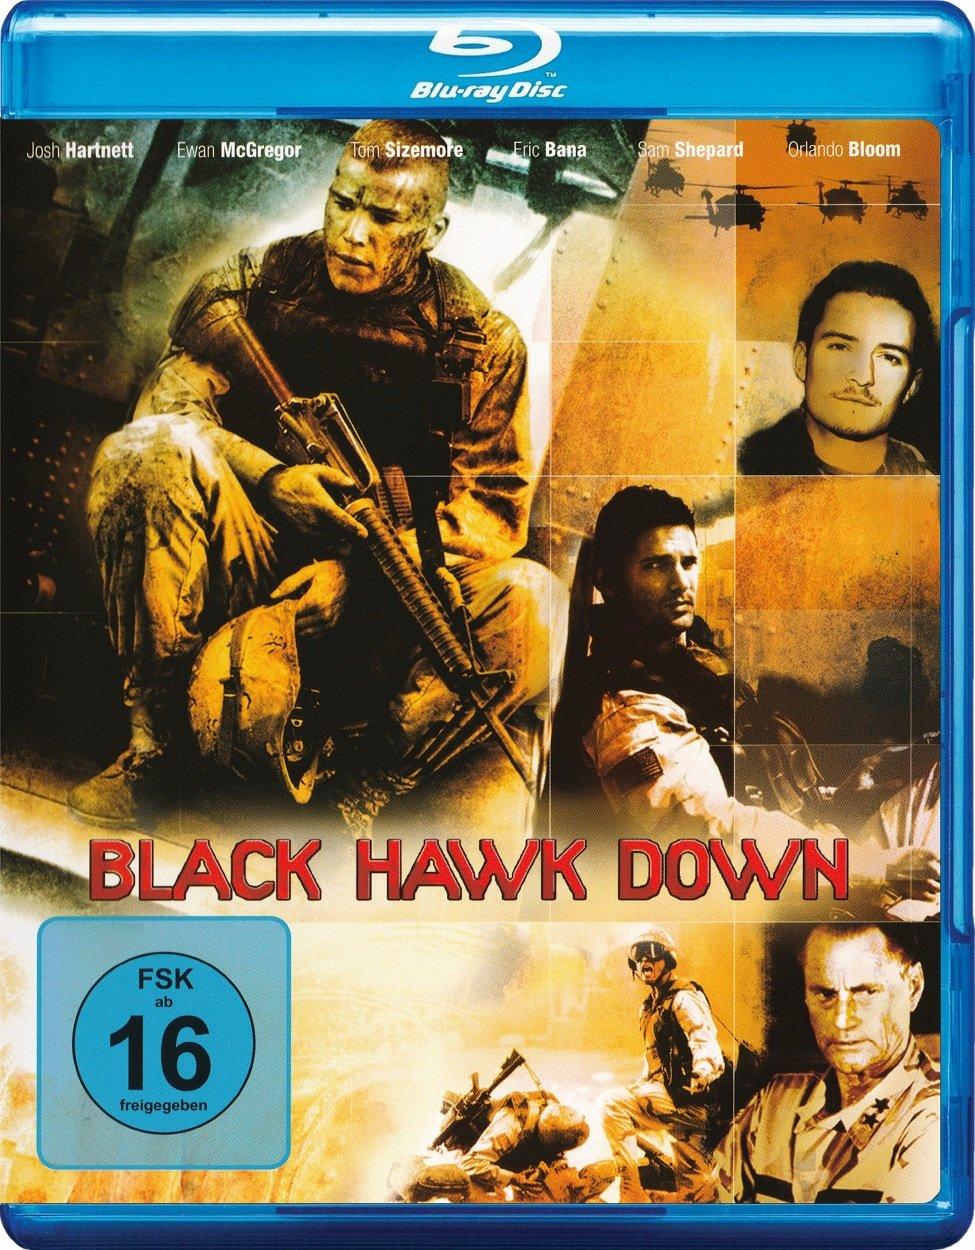 Black Hawk Down (2001) 720p + 1080p EXTENDED BluRay x264 ESubs Dual Audio [Hindi DD5.1 + English DD5.1]